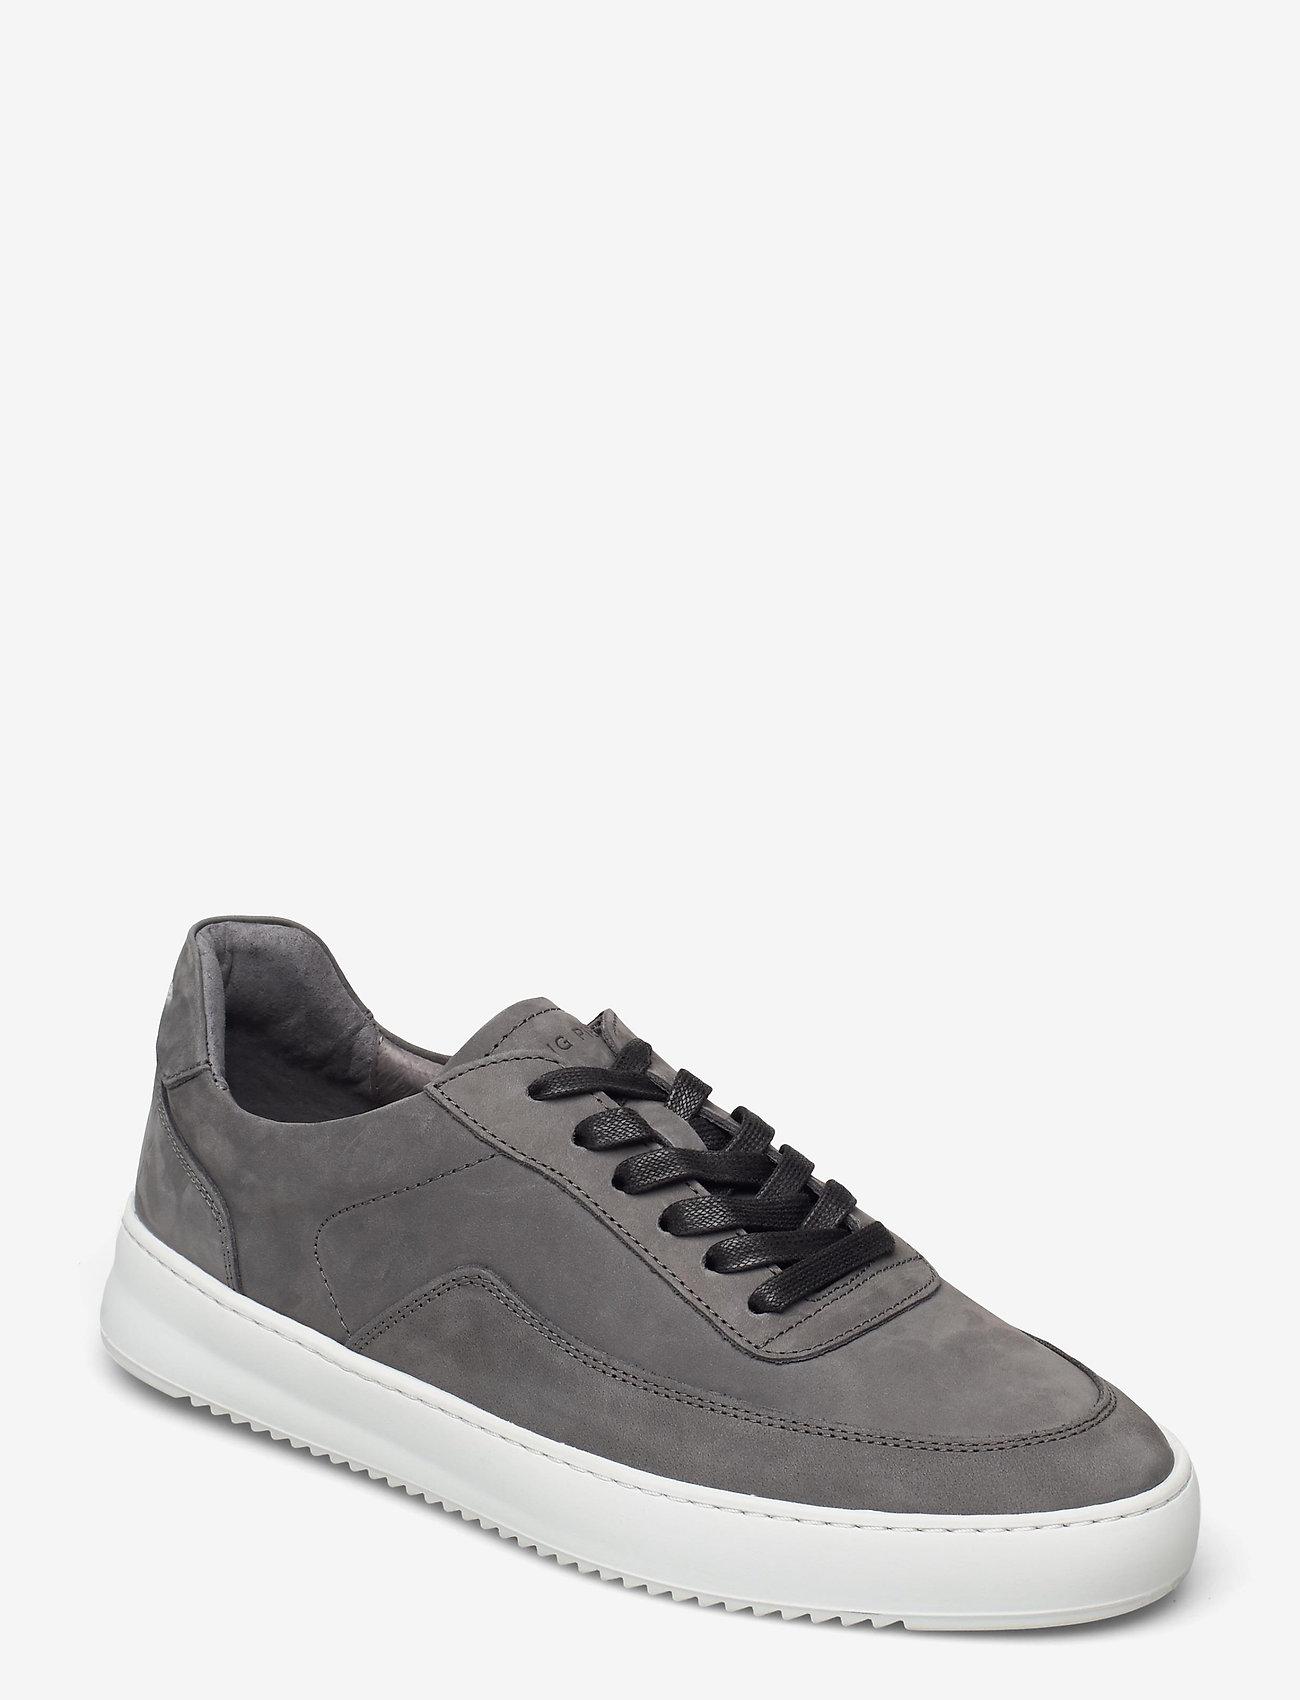 Filling Pieces - Mondo 2.0 Ripple Nubuck - låga sneakers - grey - 1